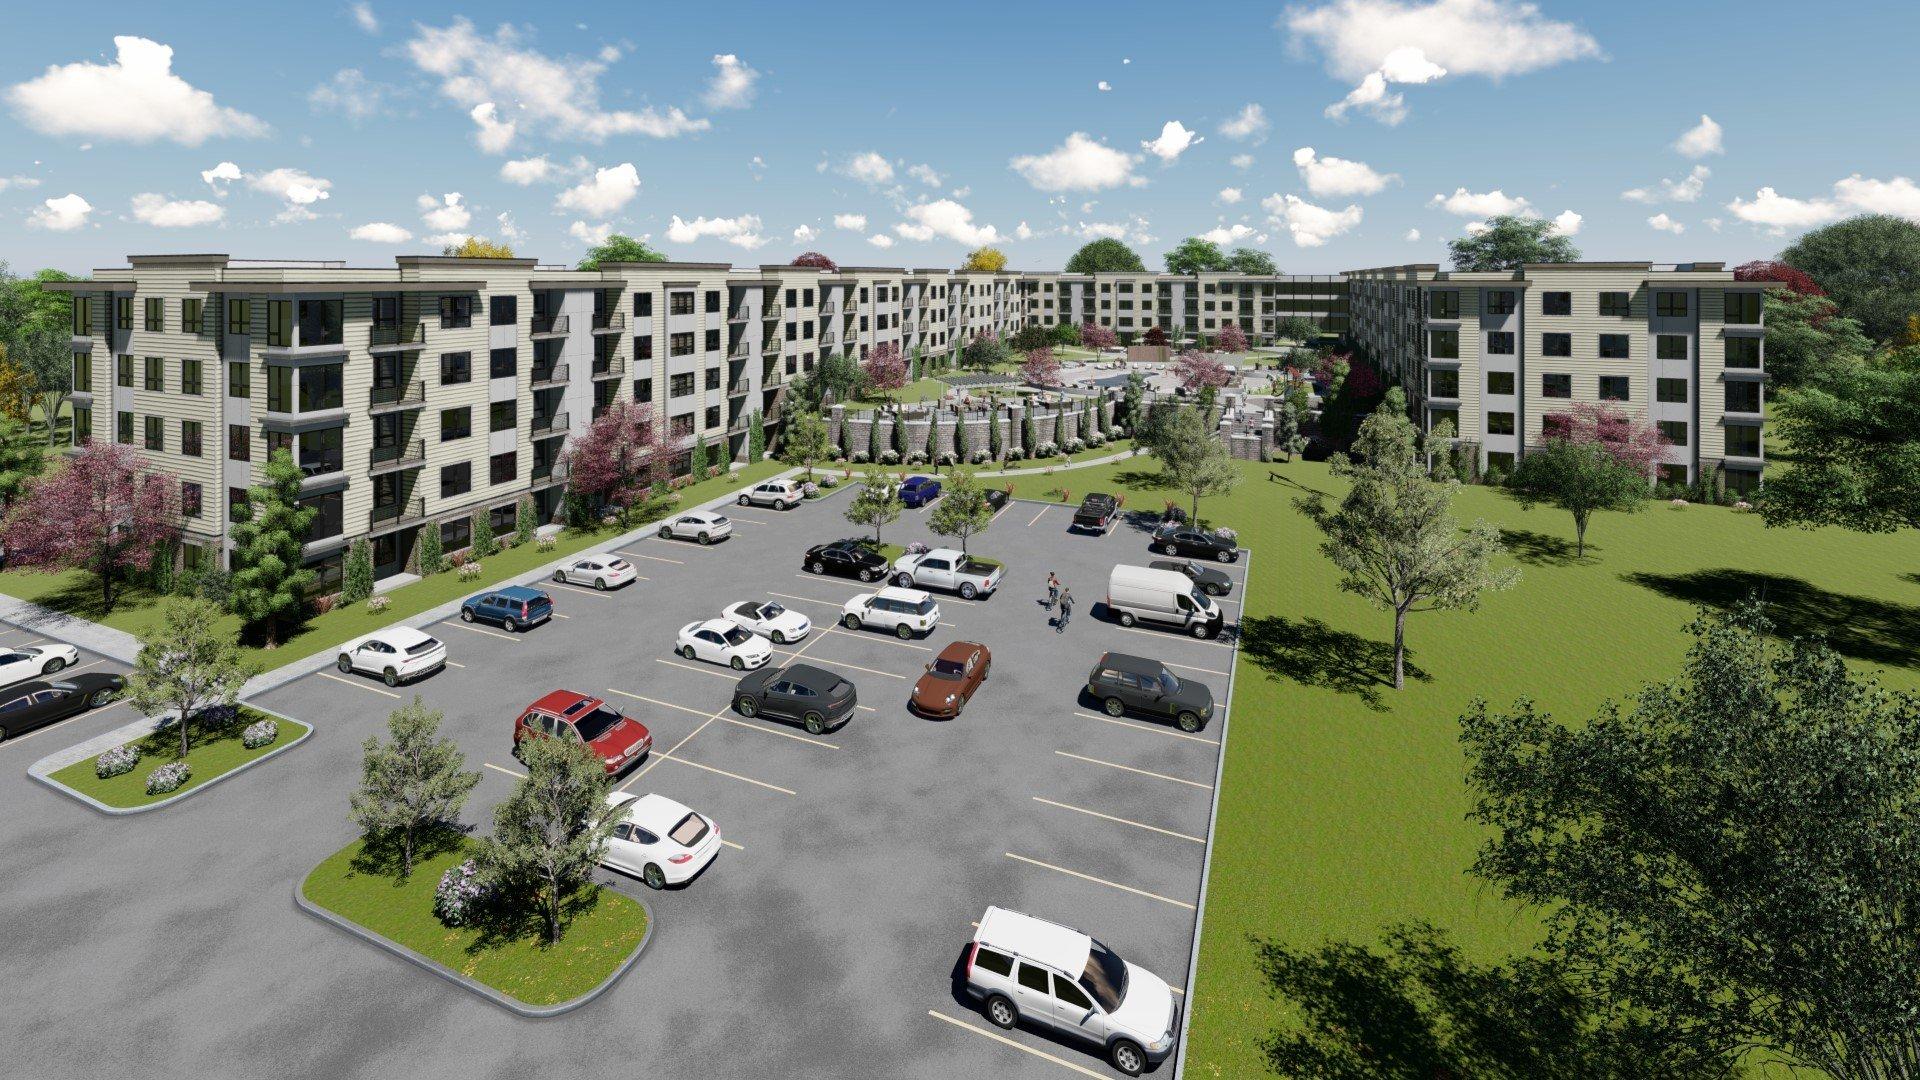 DonMar-concept-Seely-School-redevelopment